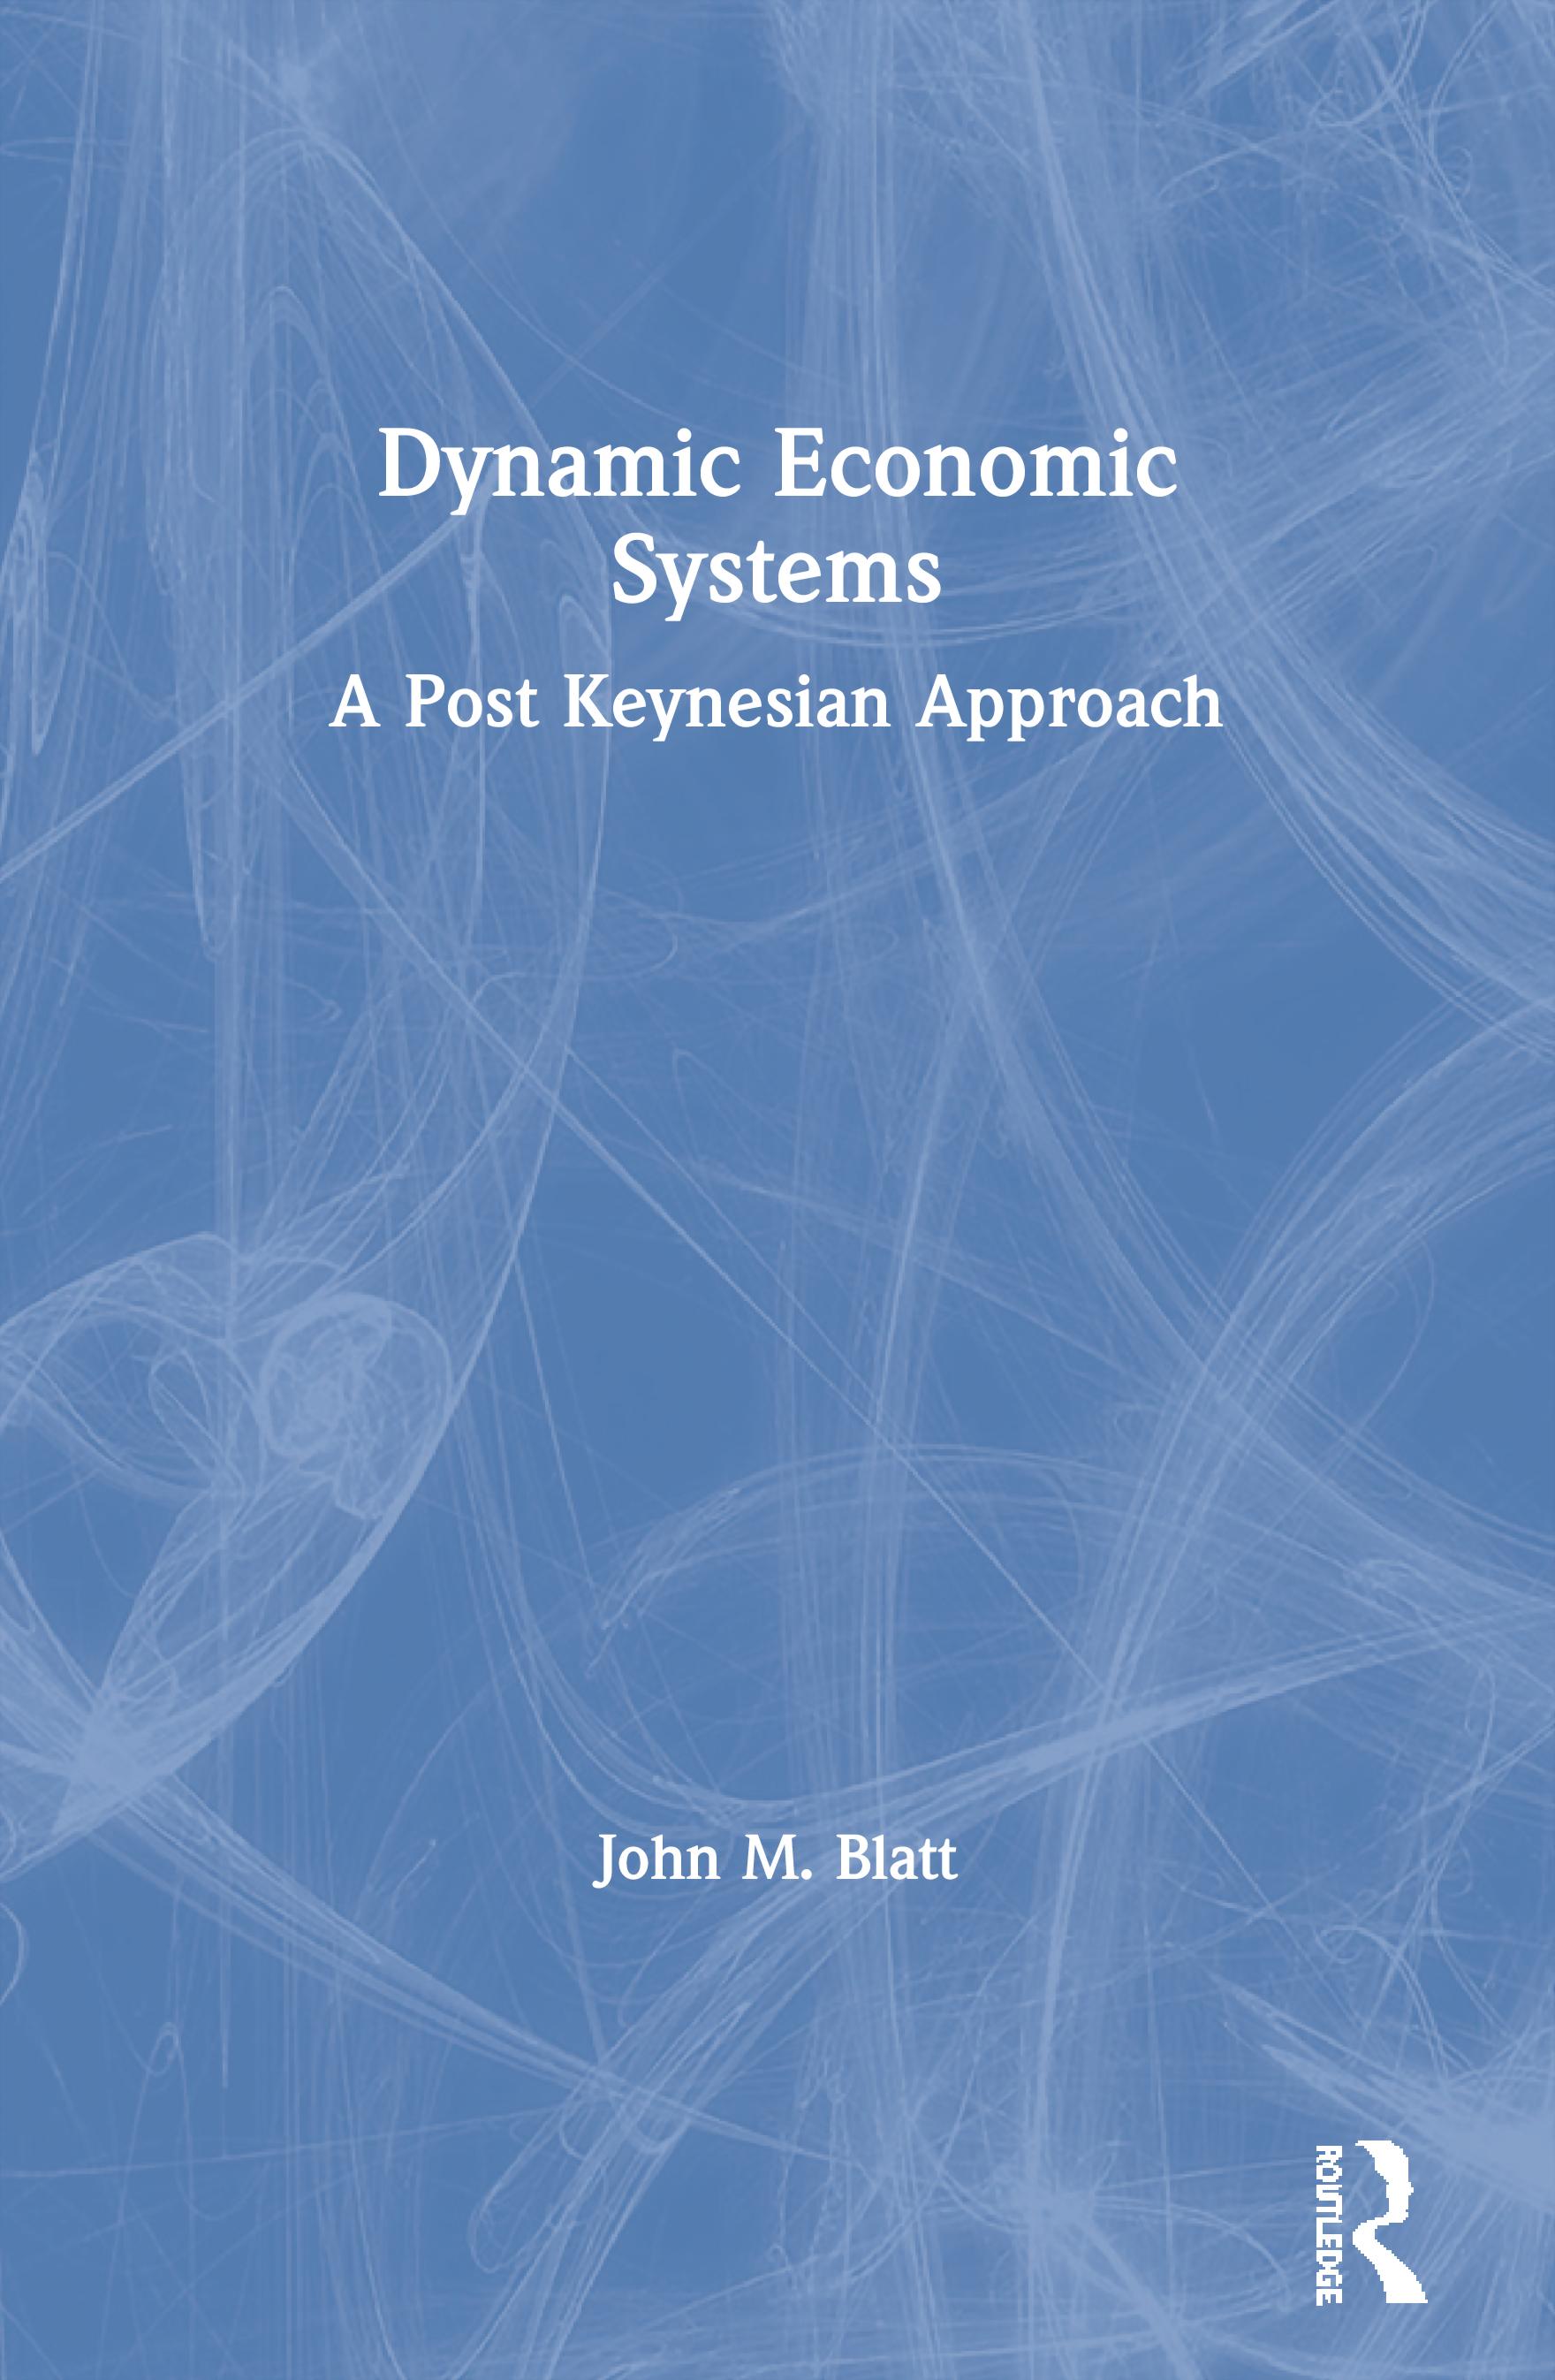 Dynamic Economic Systems